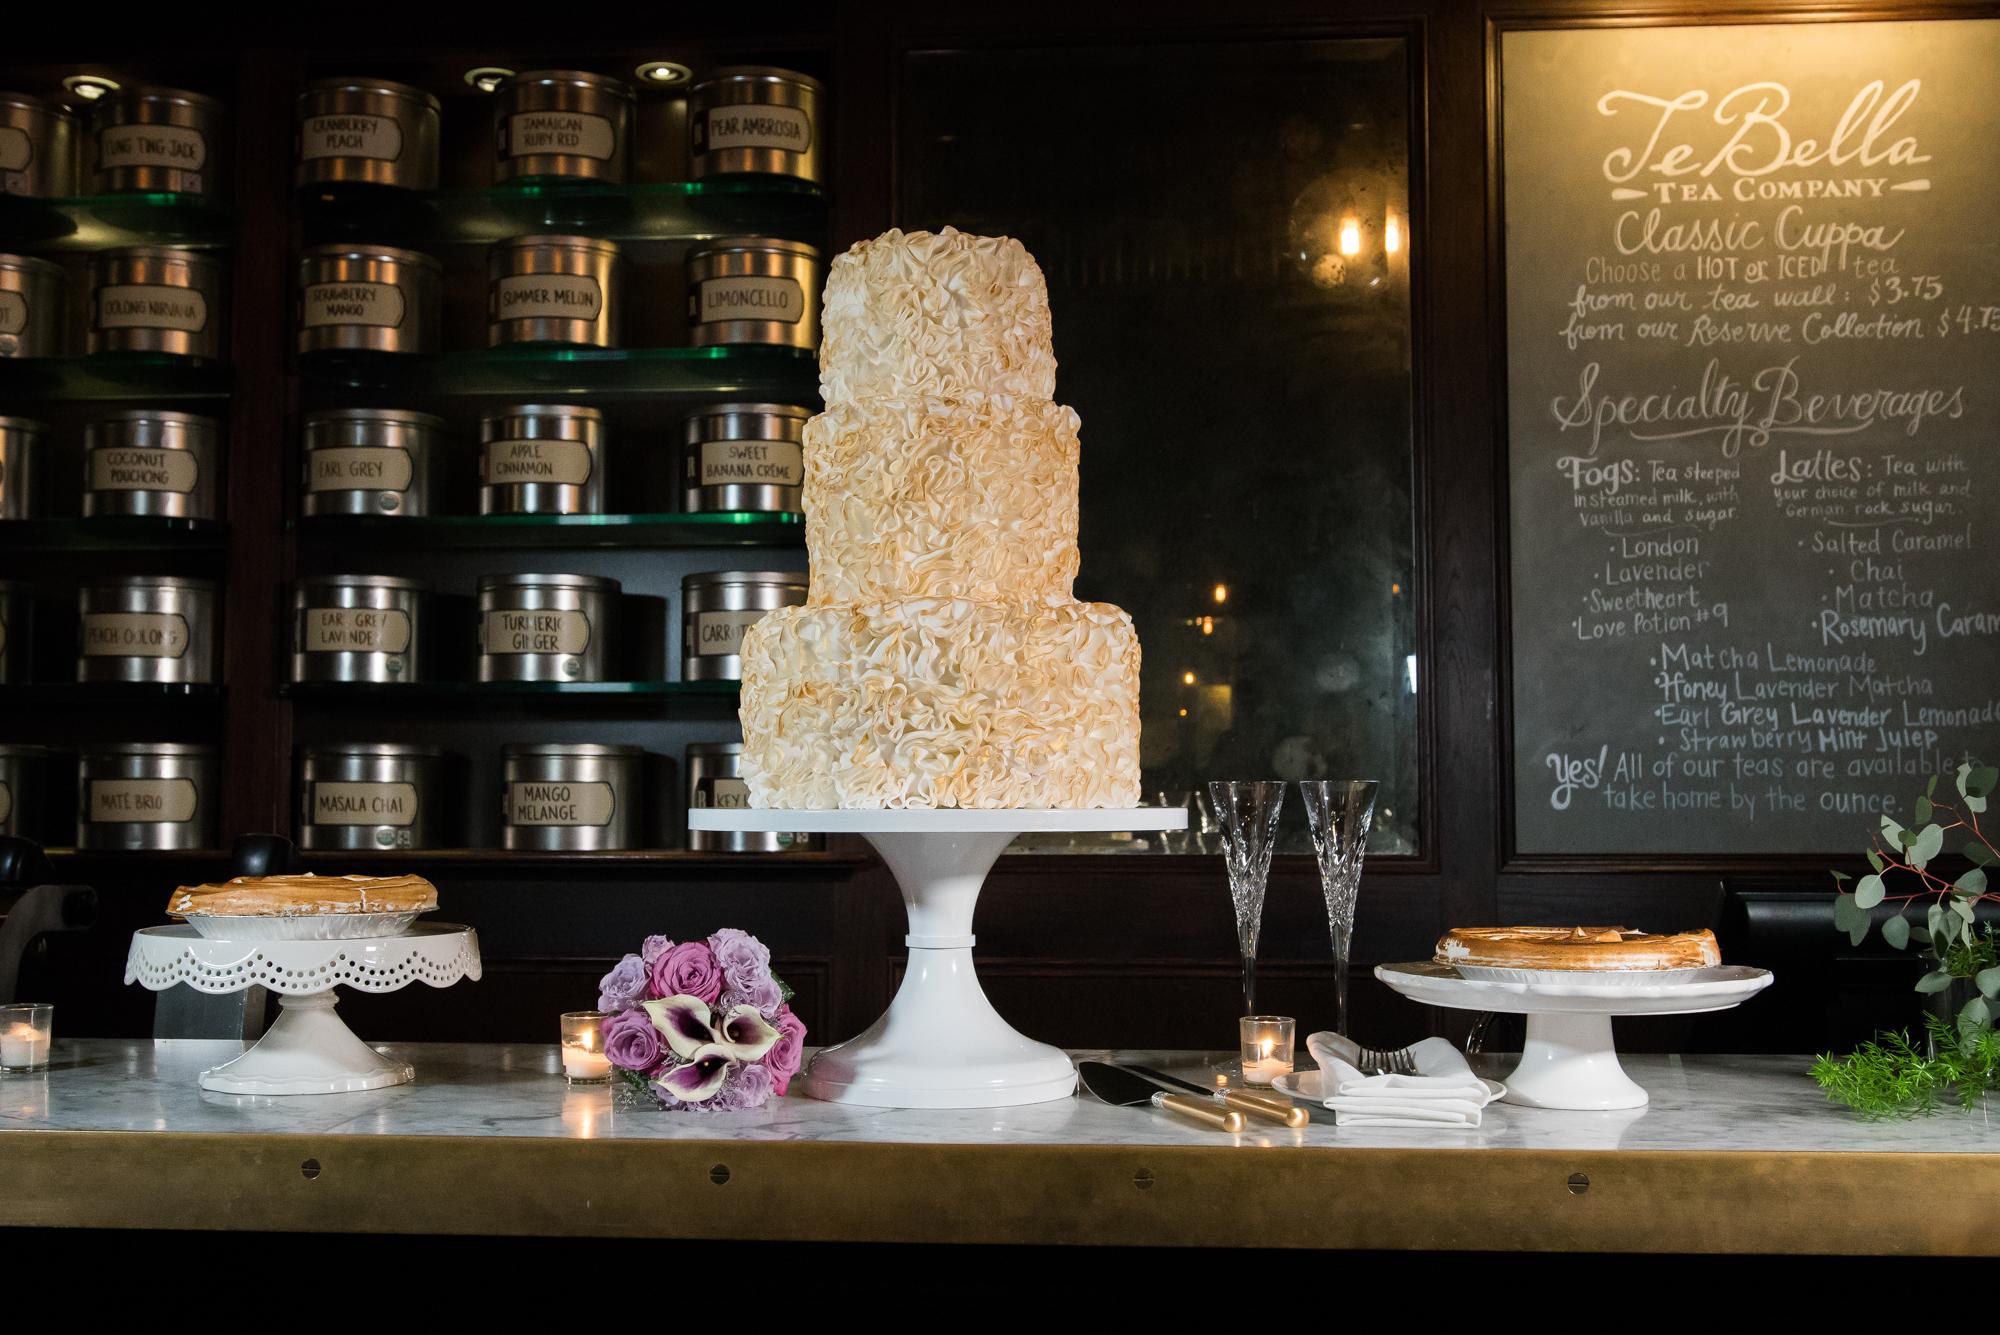 Oxford-Exchange-wedding-cake-photo